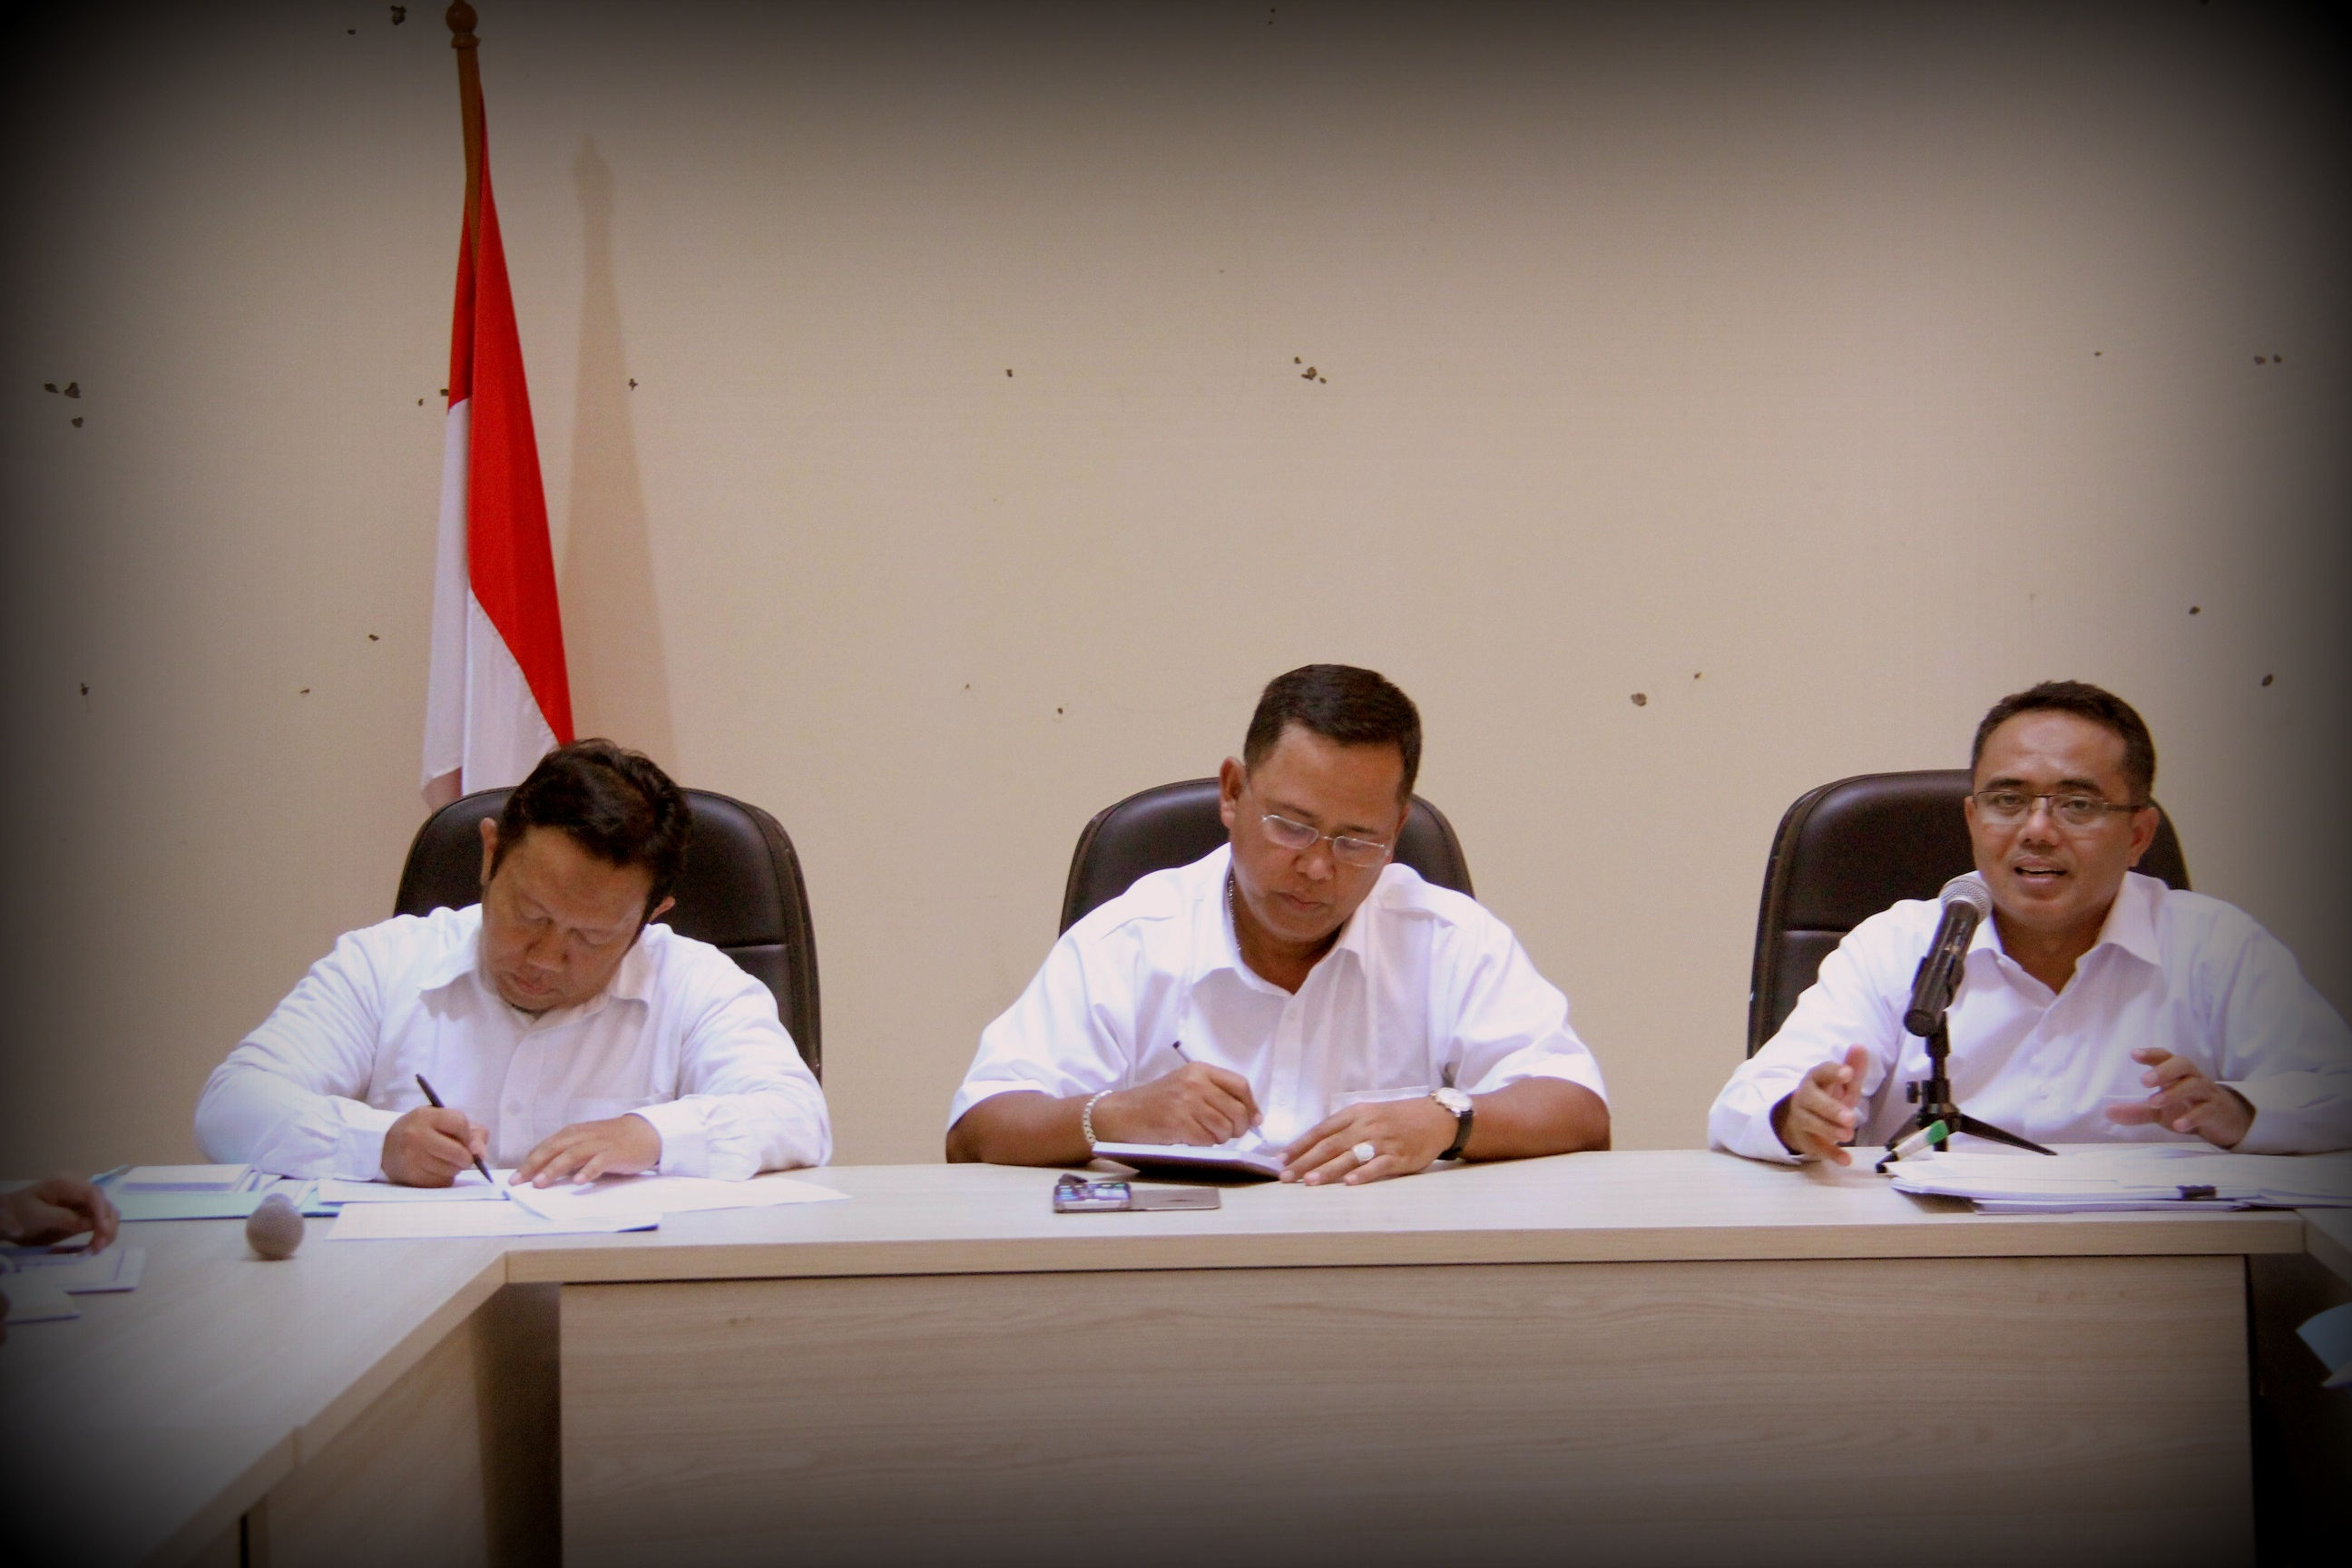 Monev Laporan Tim Revaluasi Barang Milik Negara KPKNL Bogor, Sebagai Bentuk Pembinaan Kanwil DJKN Jawa Barat.